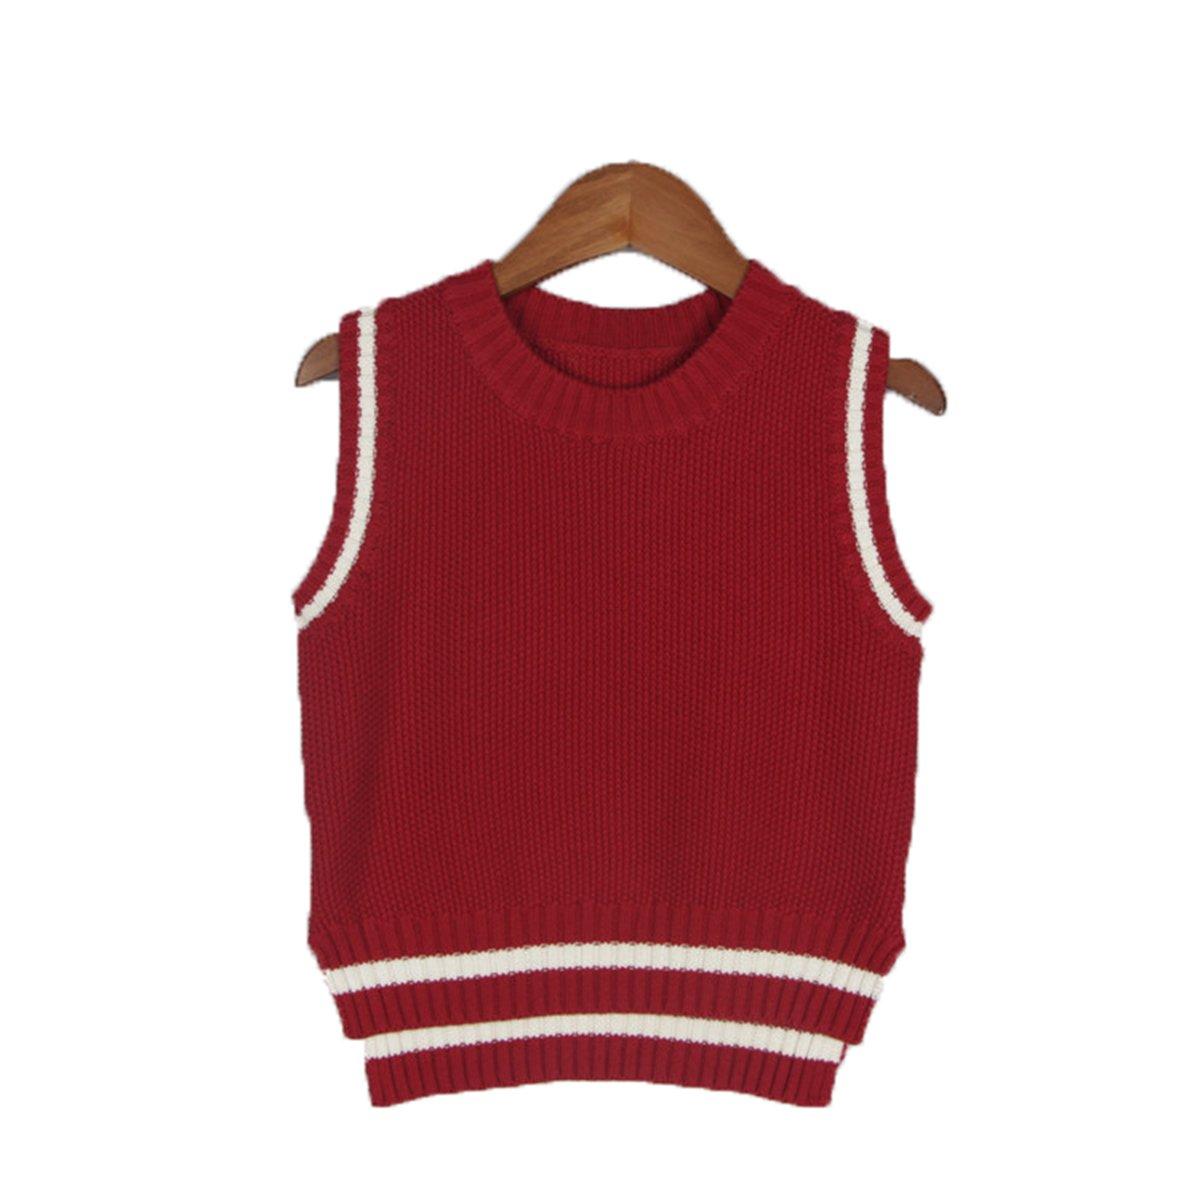 Lemonkid Newly Fall Children Kids Knit Sweater Vest Pullover Sleeveless Waistcoat 130cm/fit 5-6 T